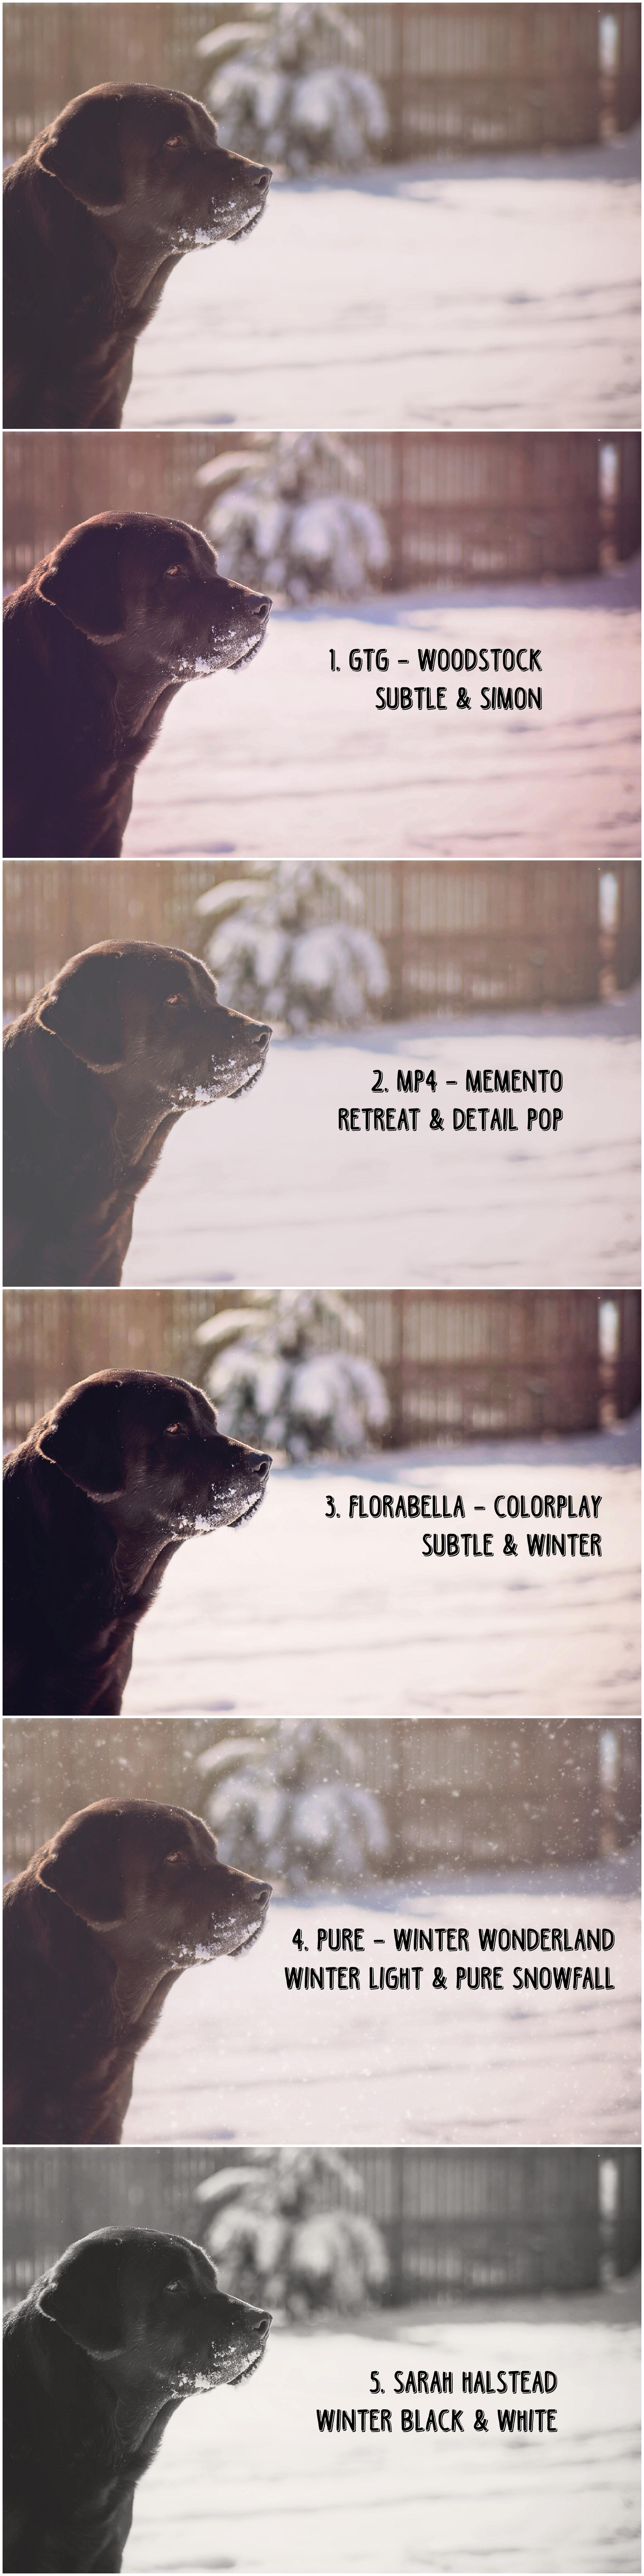 Best-Winter-Photoshop-Actions